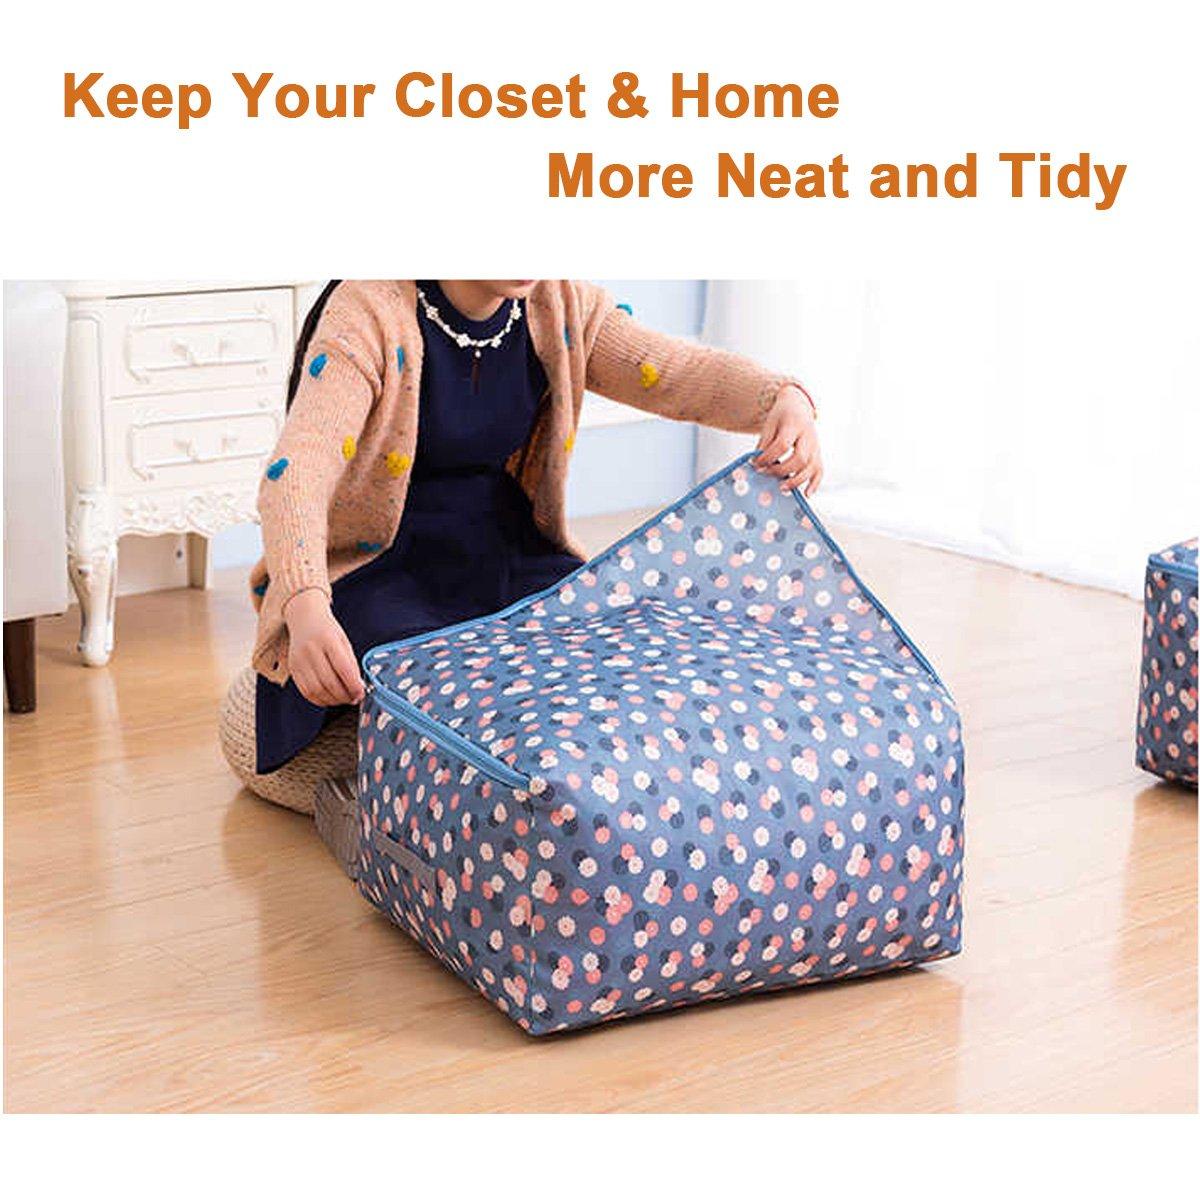 Amazon.com: Bolsa de almacenaje de edredón Bolsa de almacenamiento de tela Oxford Bolsa de almacenaje de cama debajo Caja de organizador plegable con ...